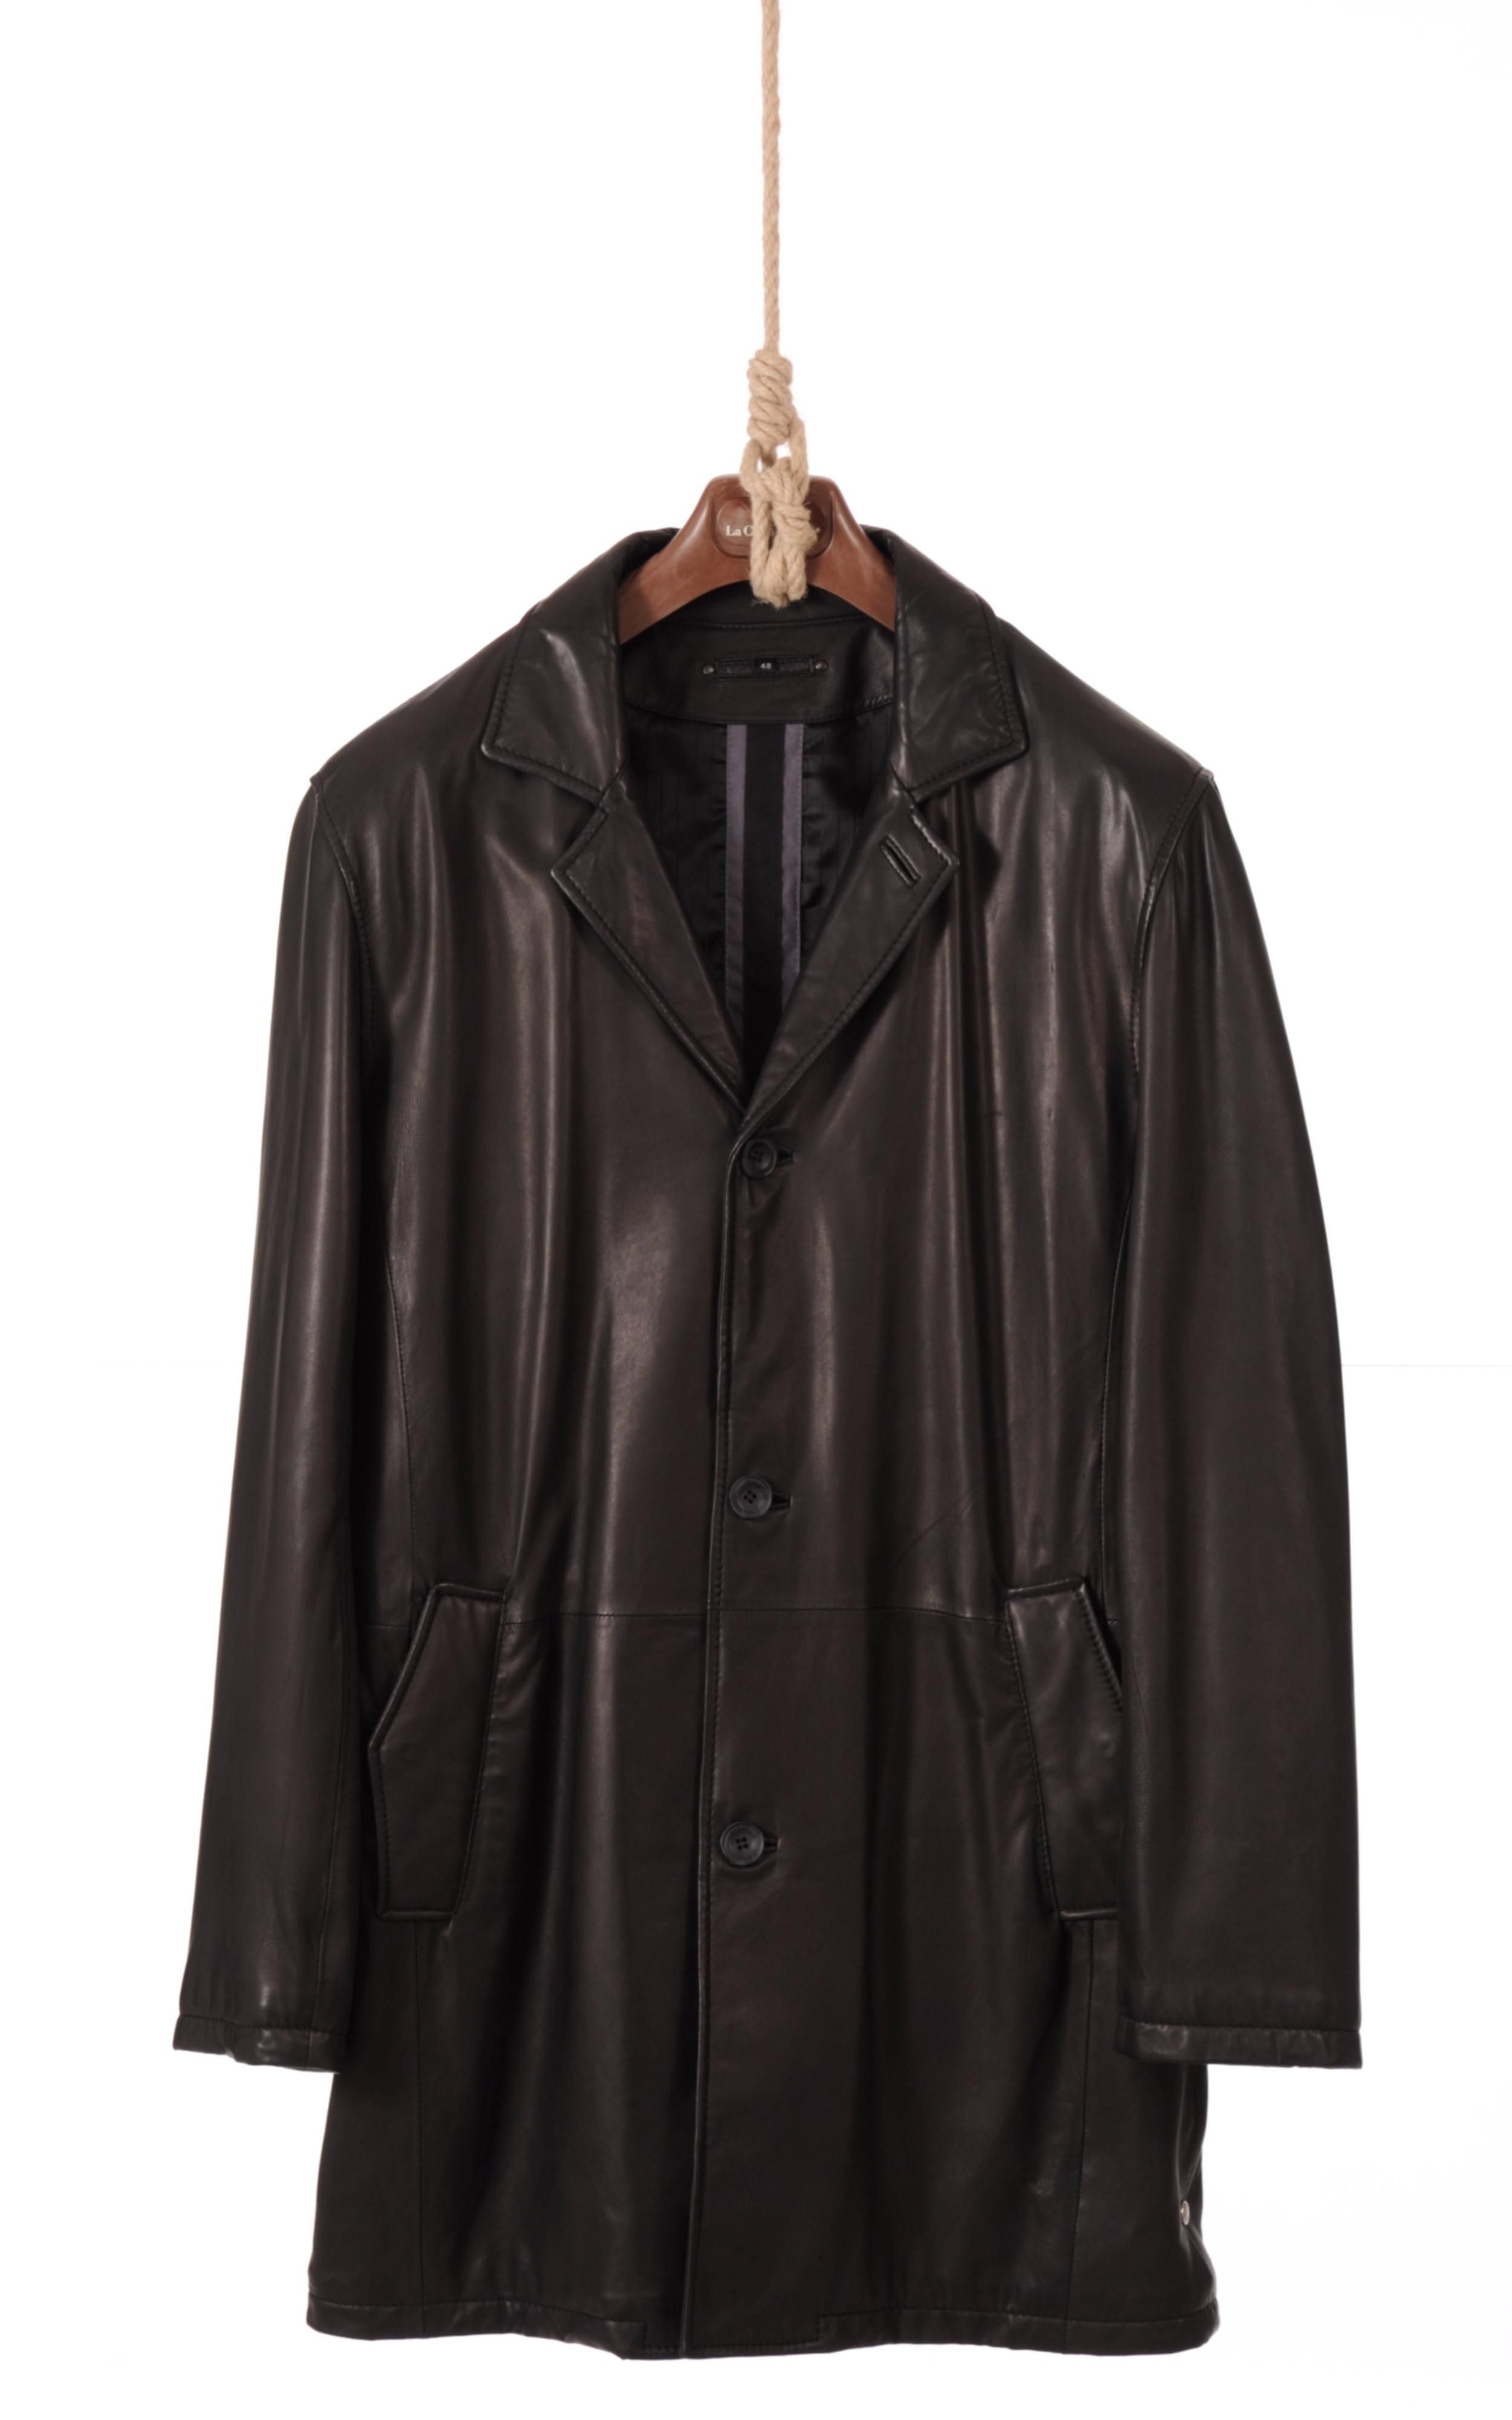 veste longue cuir homme trapper la canadienne veste 3 4 cuir noir. Black Bedroom Furniture Sets. Home Design Ideas